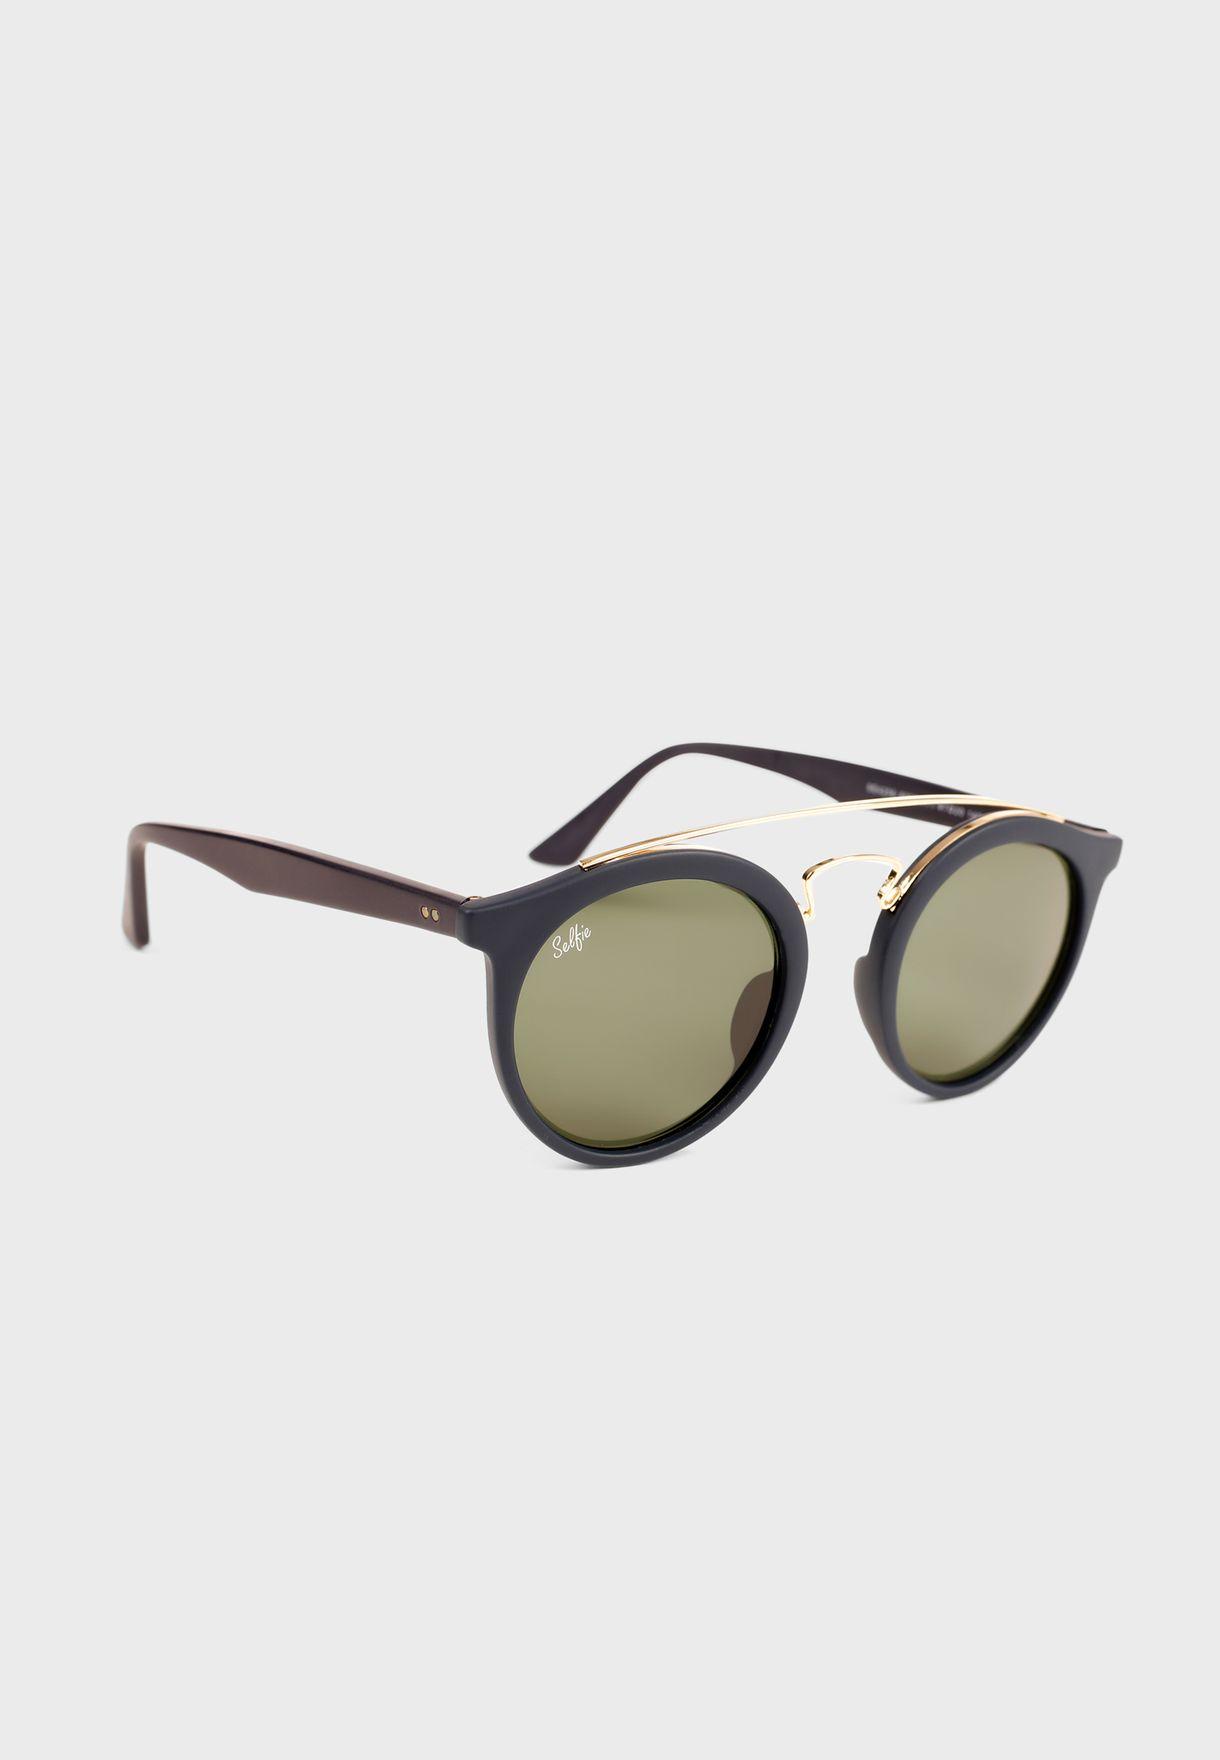 Acetate Matt Round Sunglasses